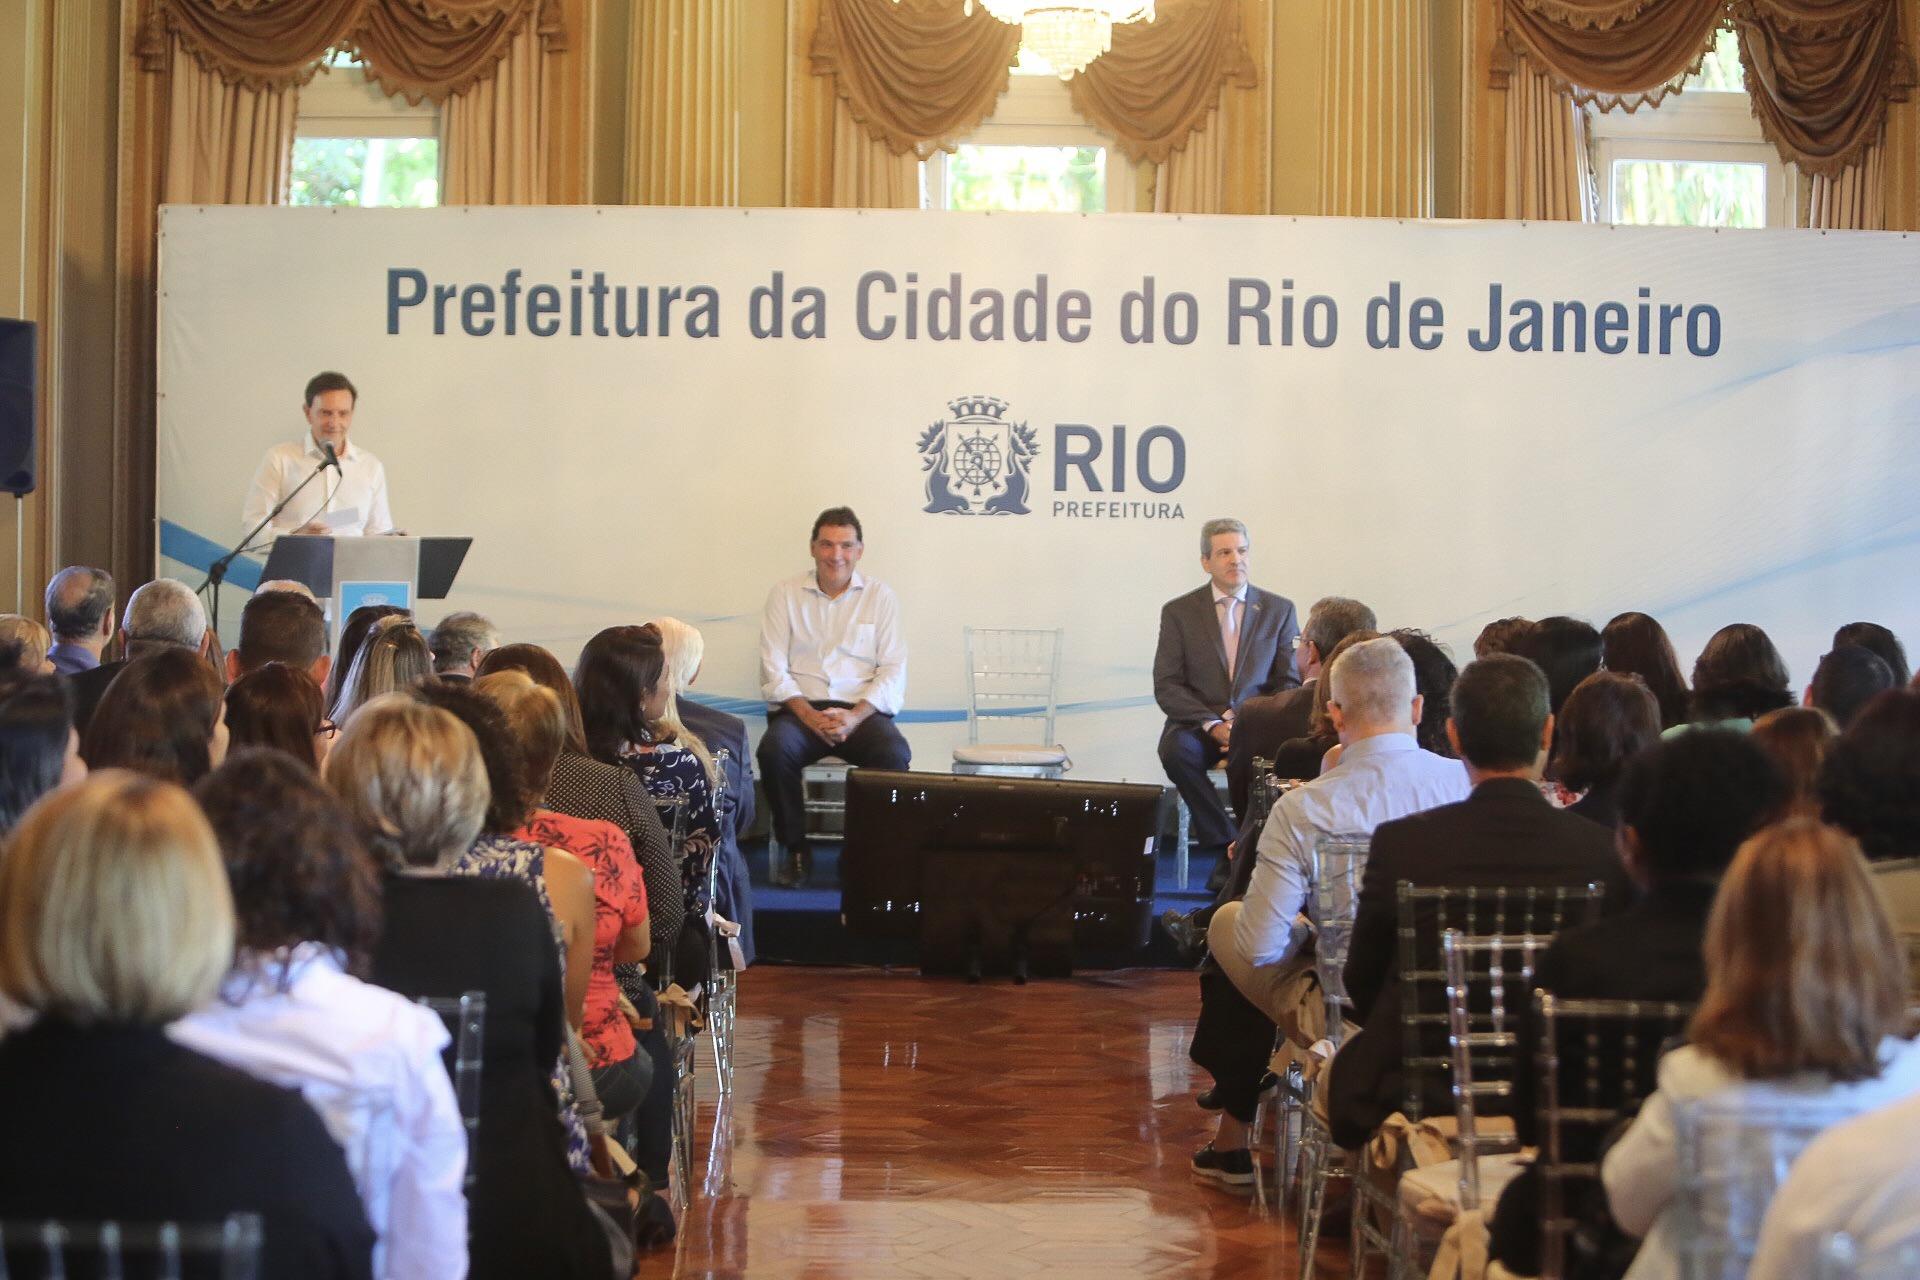 Prefeitura lança programa de tratamento de varizes graves que dispensa cirurgia